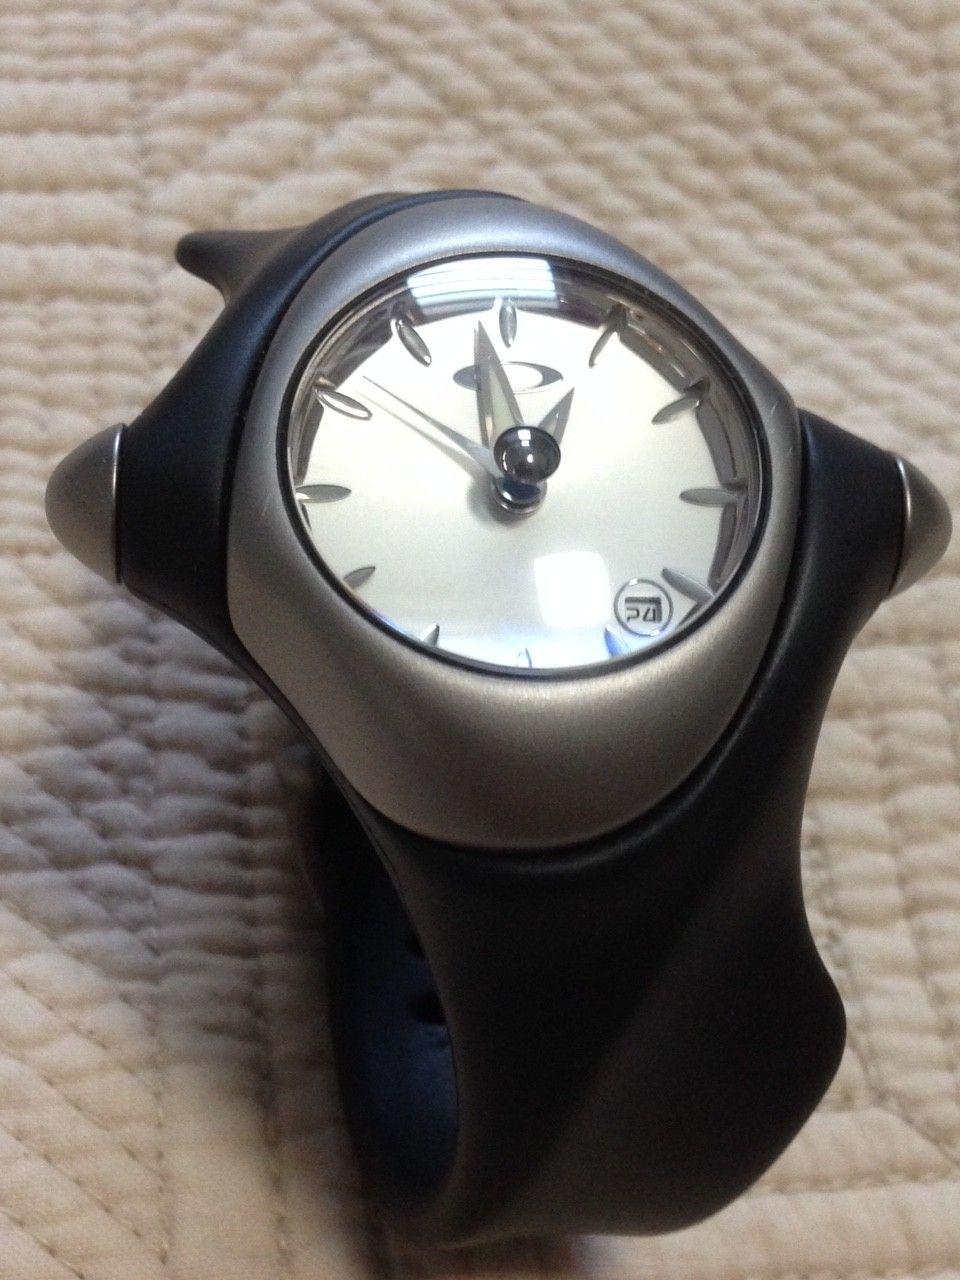 New Bullet Titanium Watch 10-110 - IMG_7793.JPG